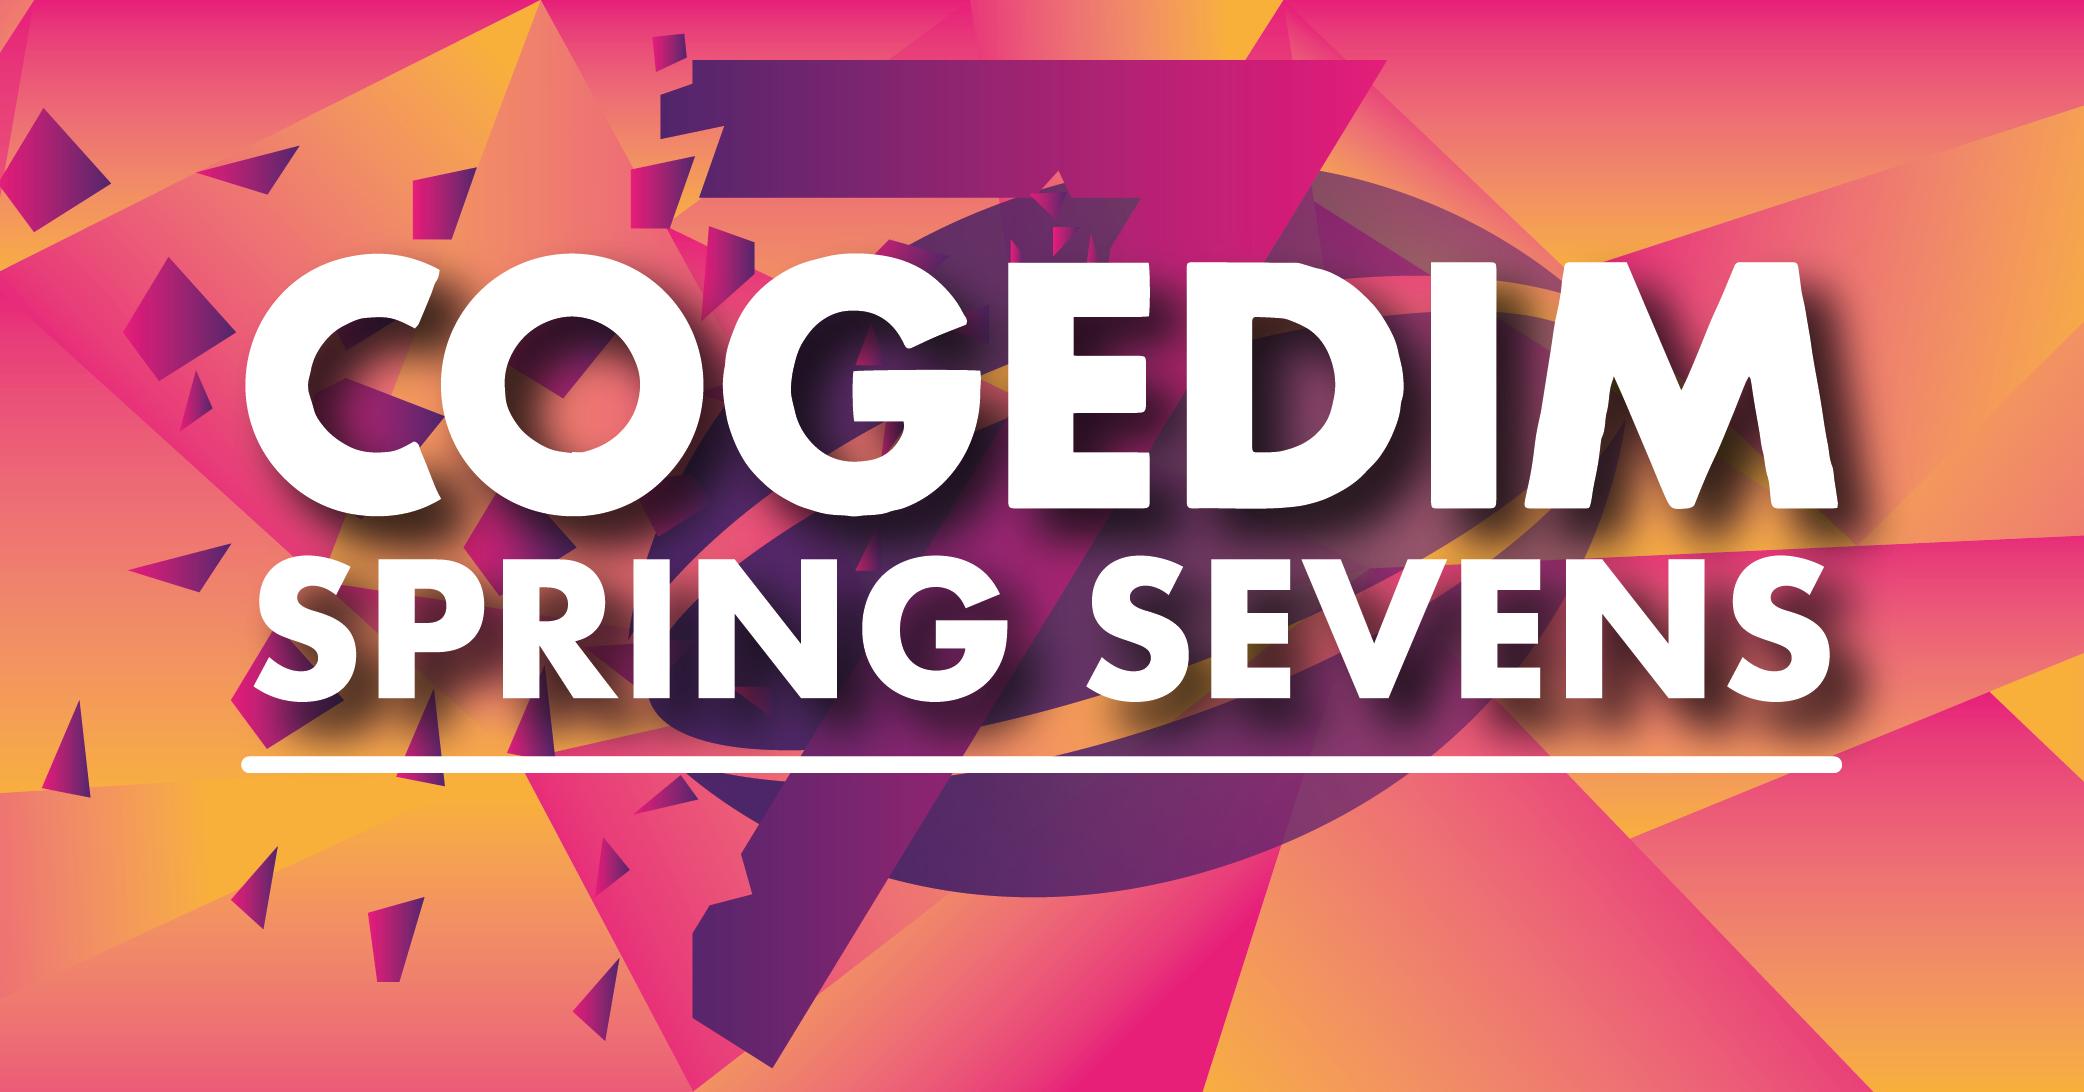 Cogedim Spring Sevens